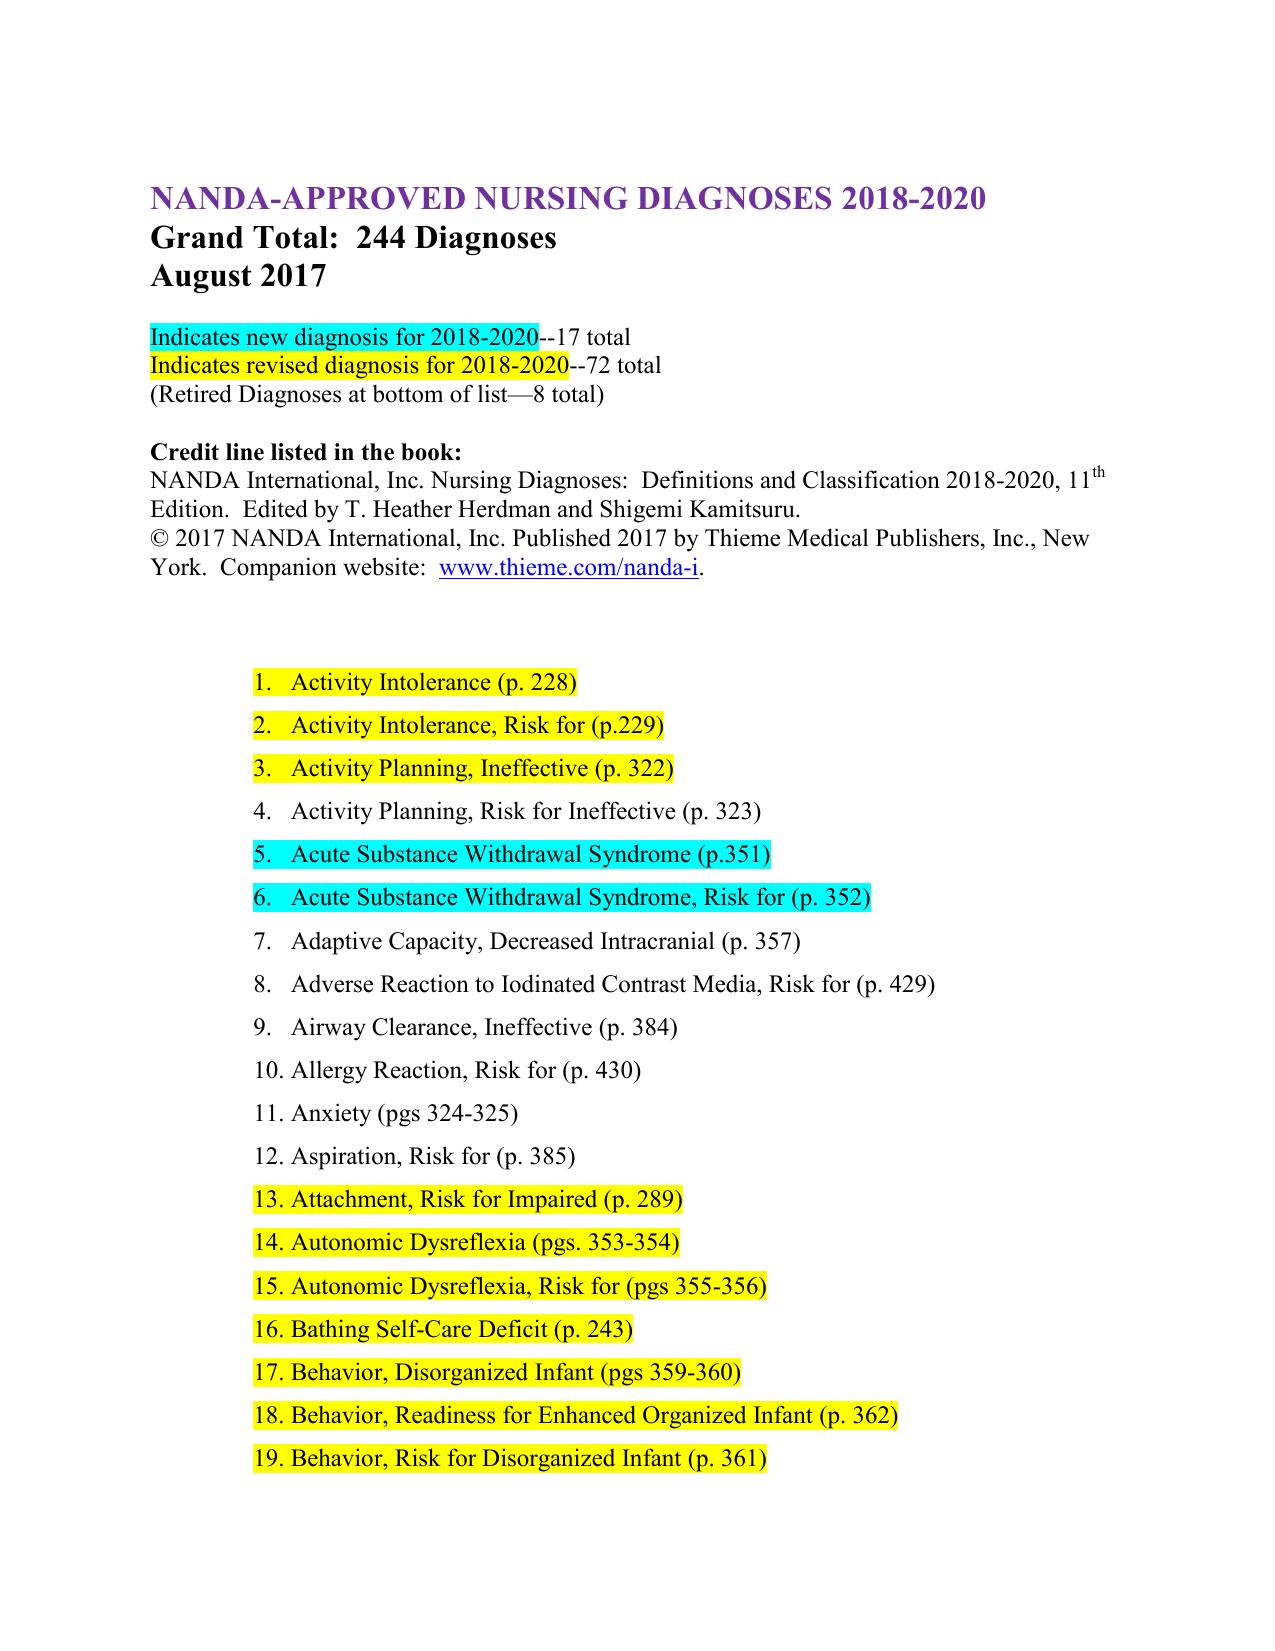 Nanda Nursing Diagnosis List 2020.Latest Nanda List